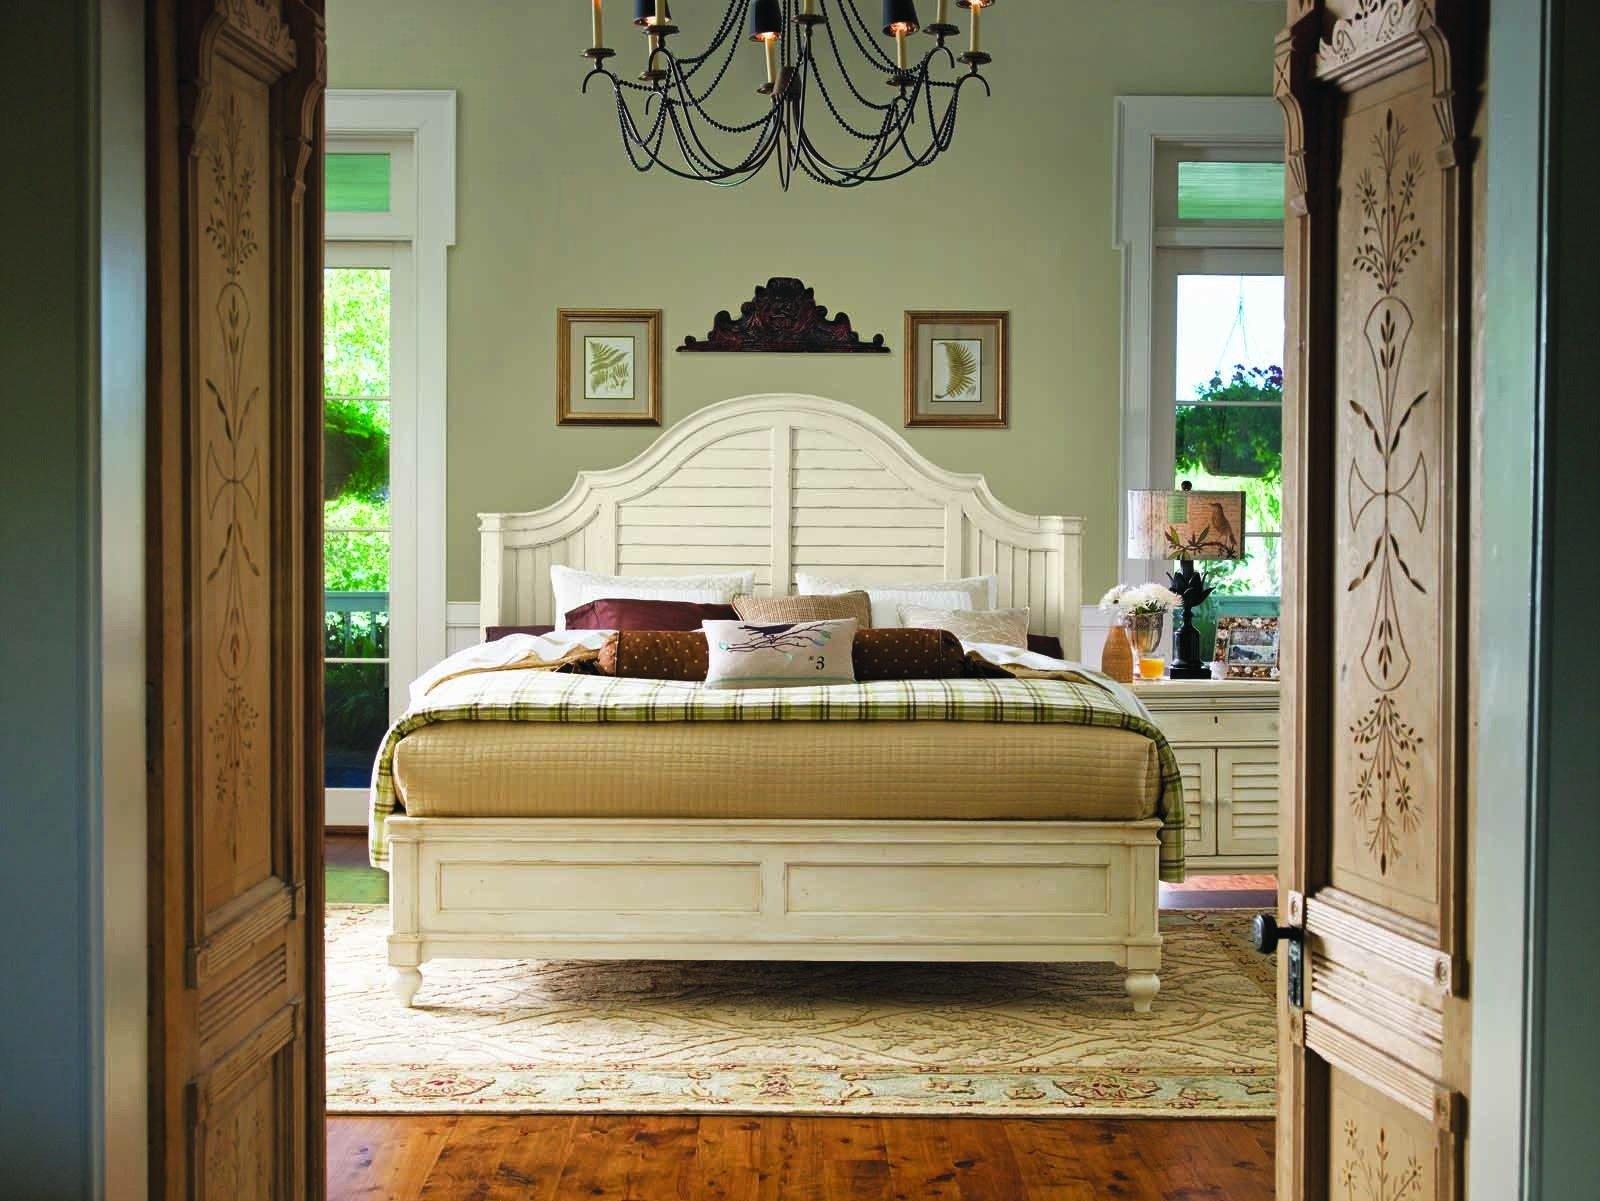 Paula Deen Steel Magnolia Bedroom Set Awesome Paula Deen Home Steel Magnolia Platform Bedroom Set In Linen